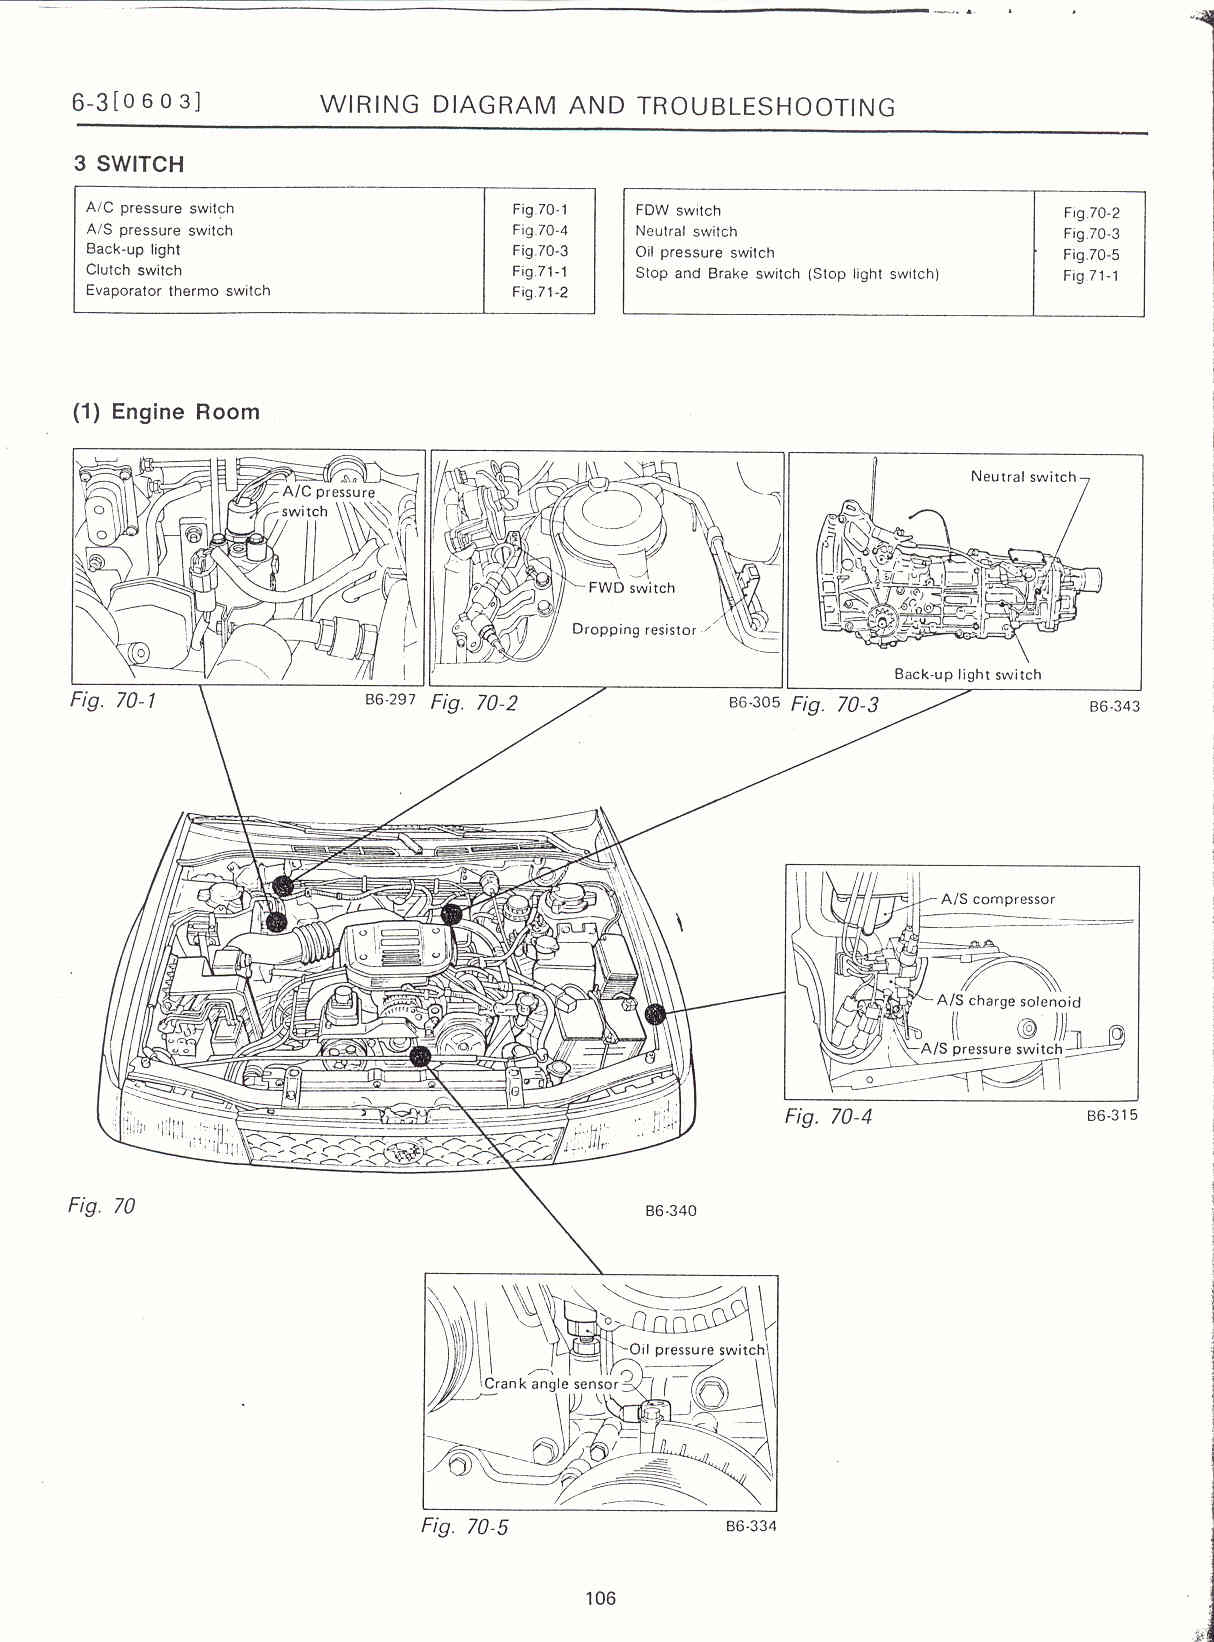 2002 subaru wrx ecu wiring diagram trailer light 4 wire transmission free engine image